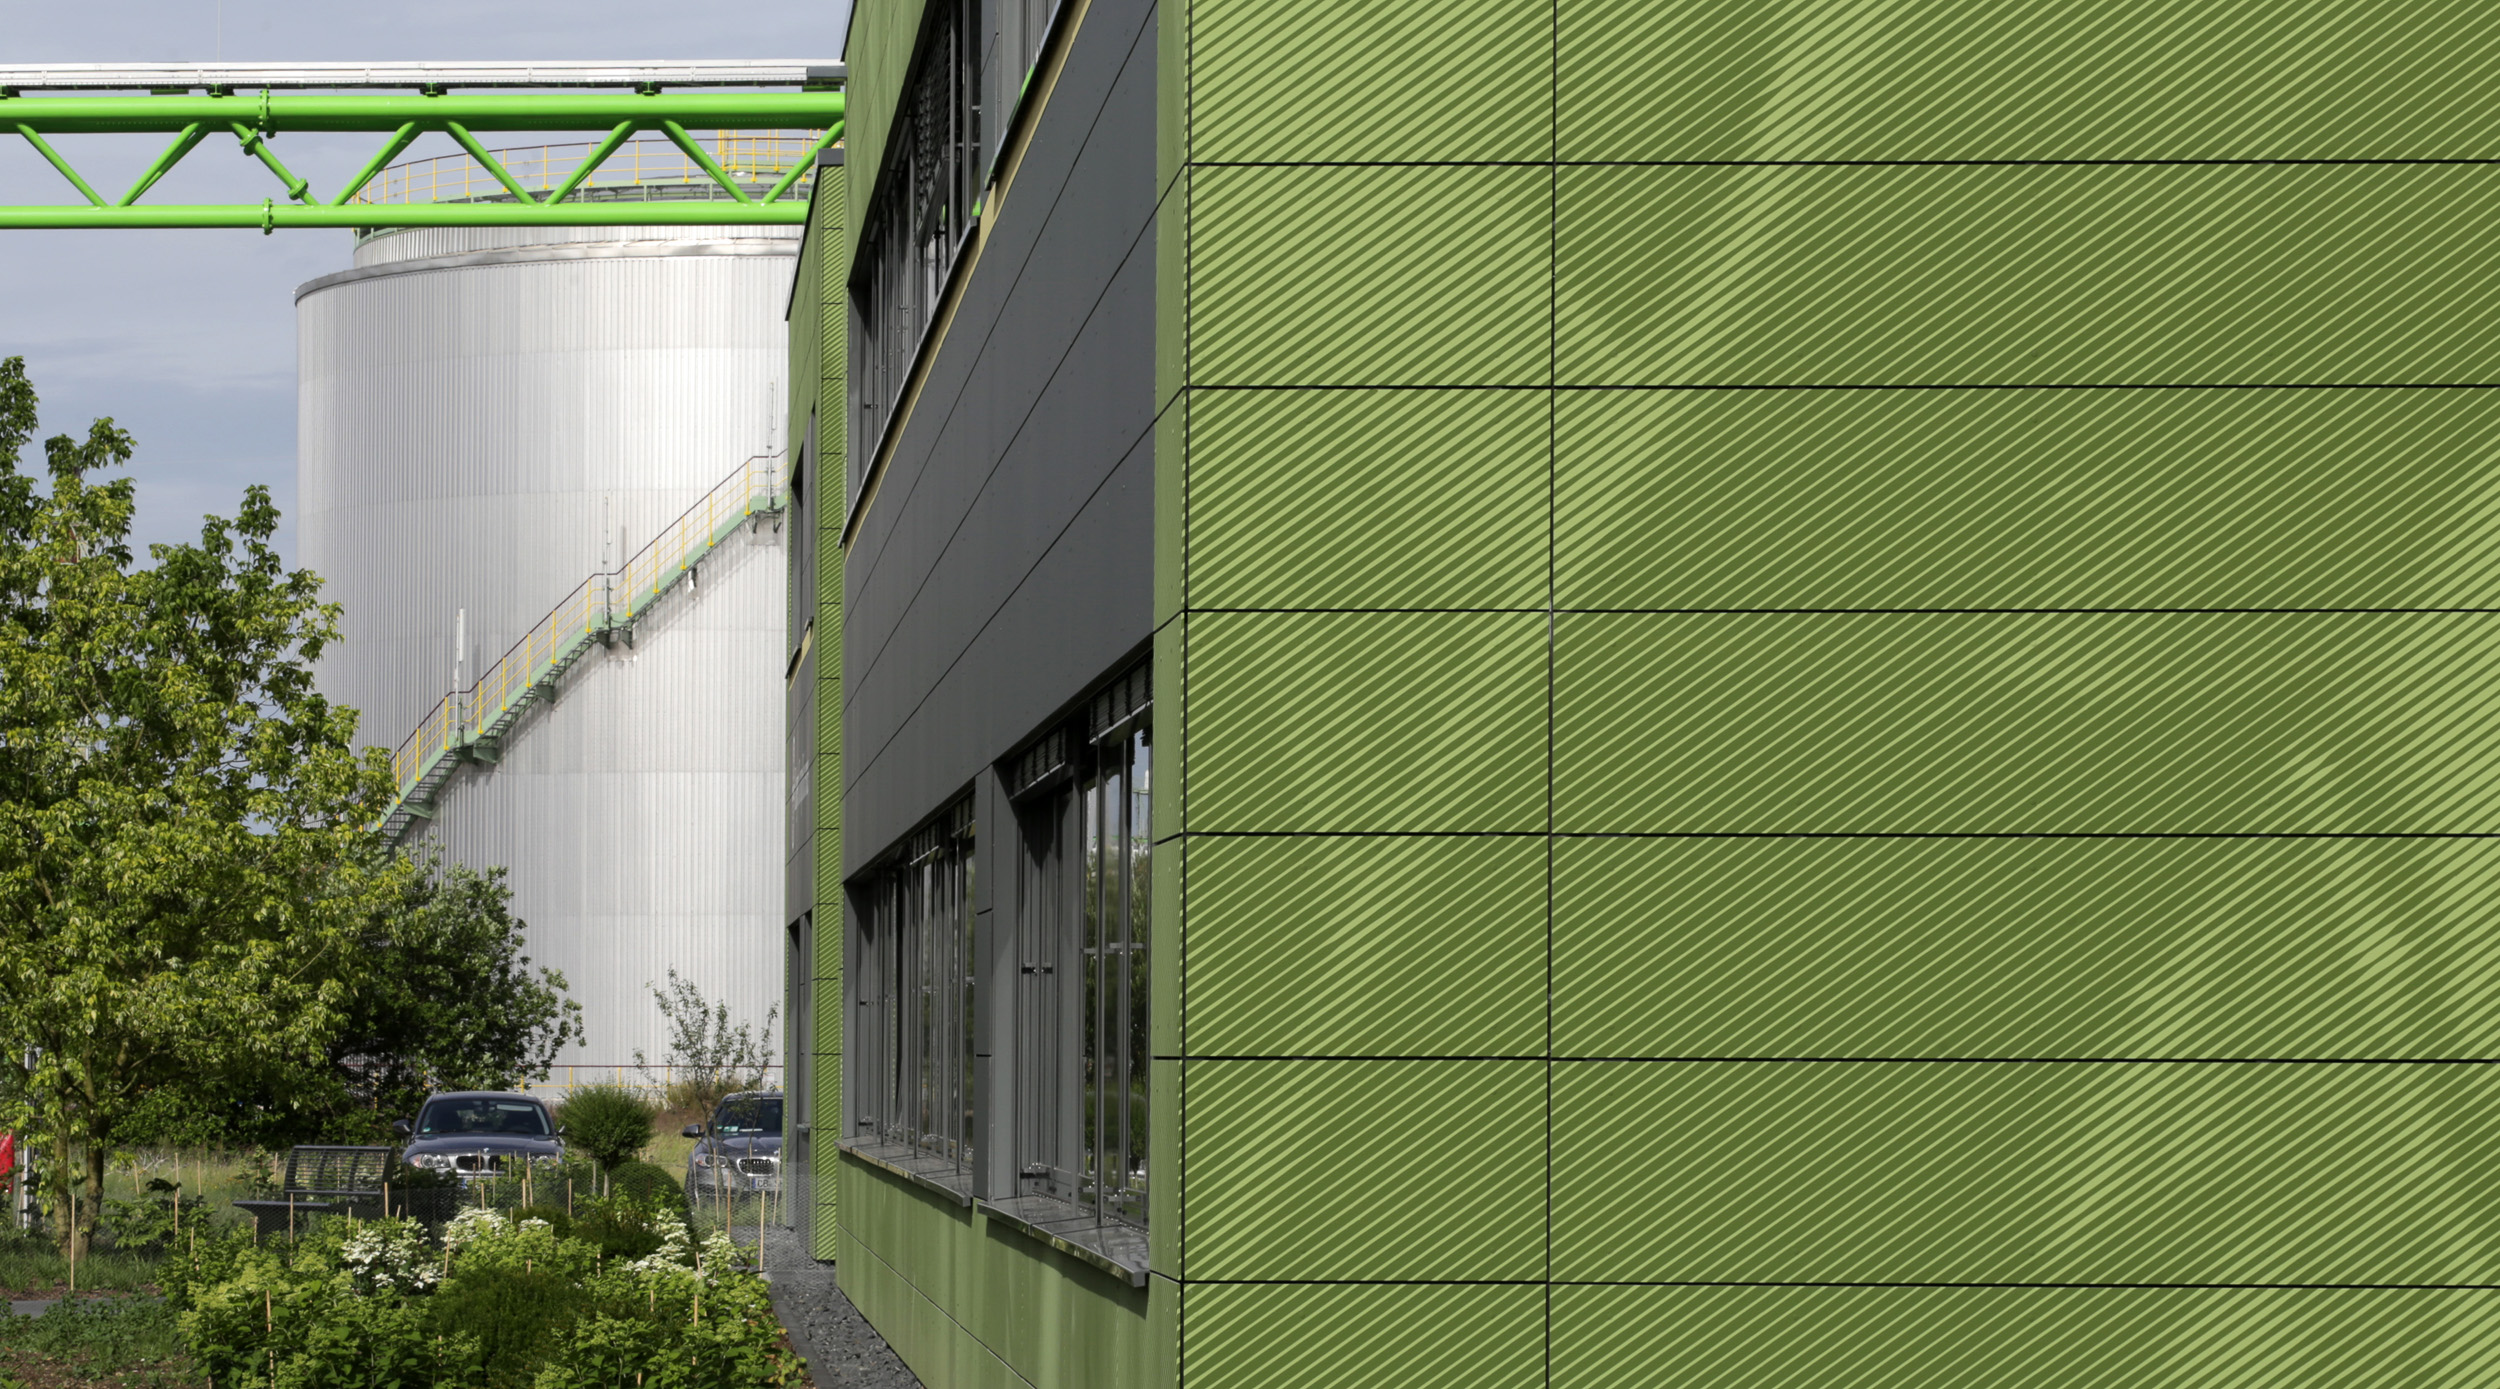 Fassadengestaltung-Industrie-Betriebszentrale-Bayer-Buero-Eternit-Dormagen-mural-grashalme.jpg